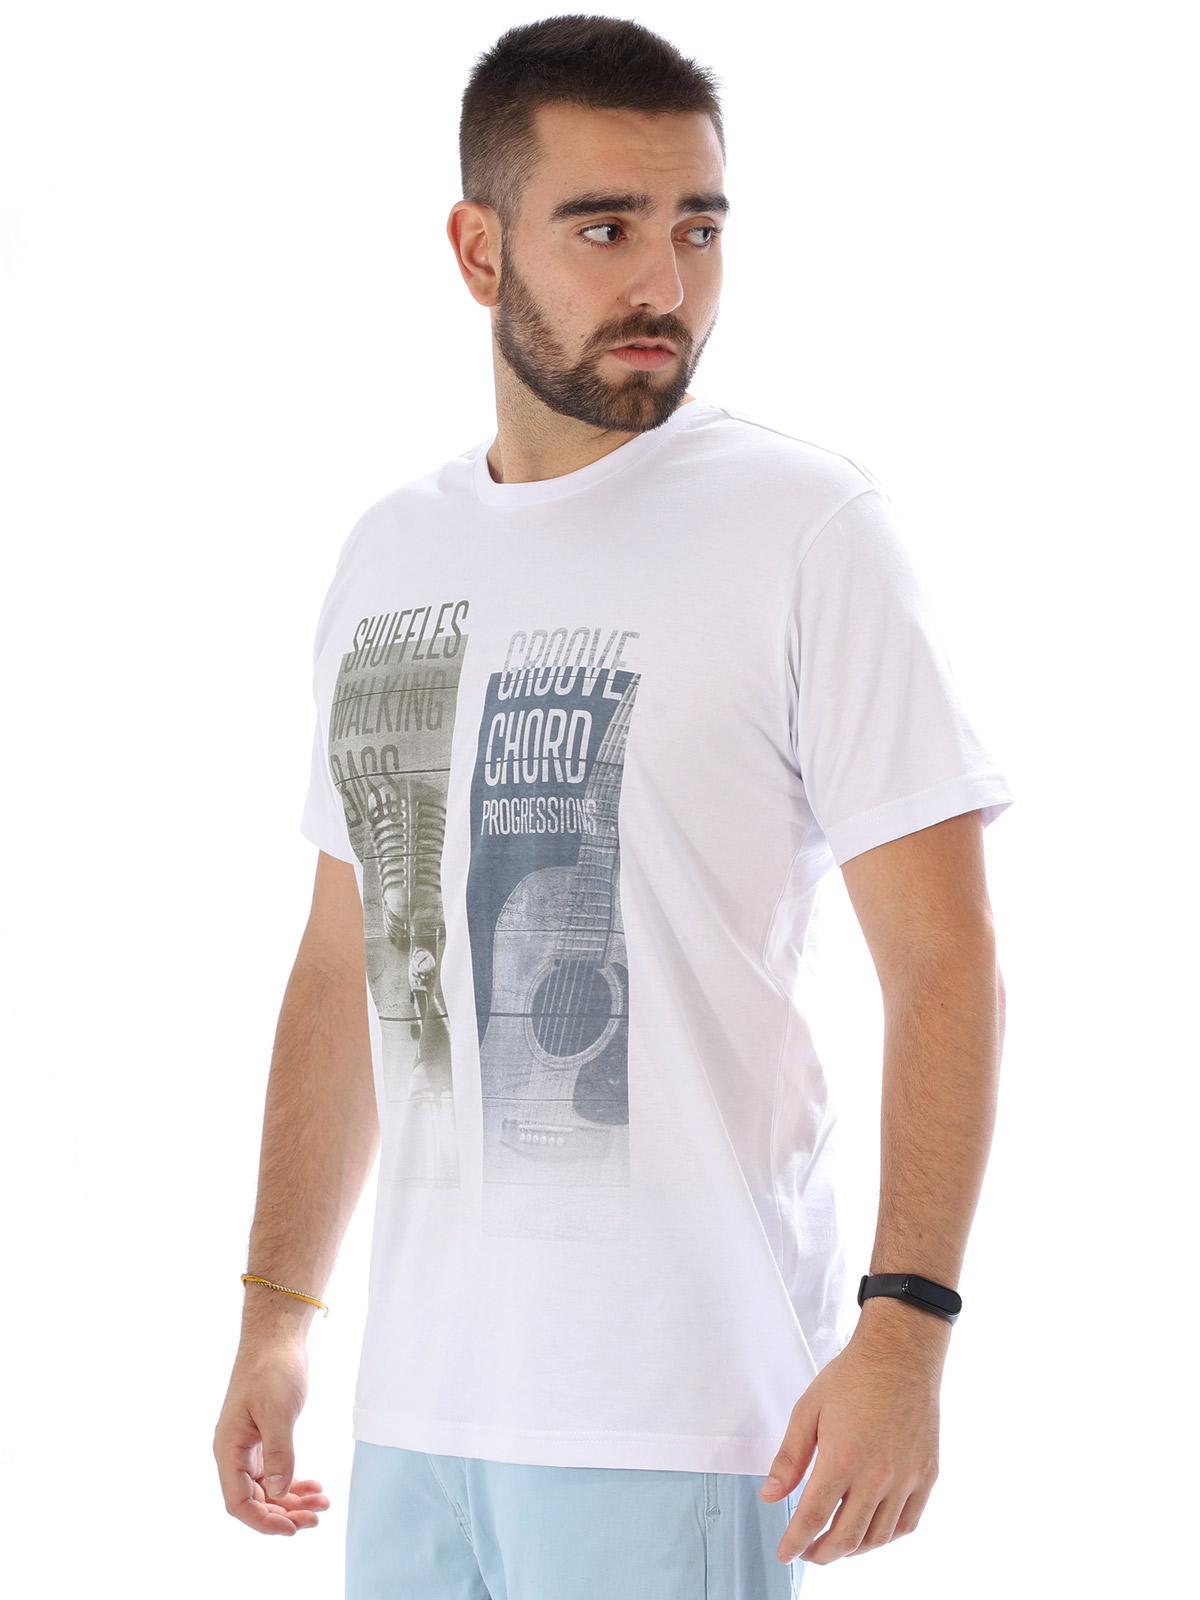 Camiseta Masculina Manga Curta Básica Groover Branco